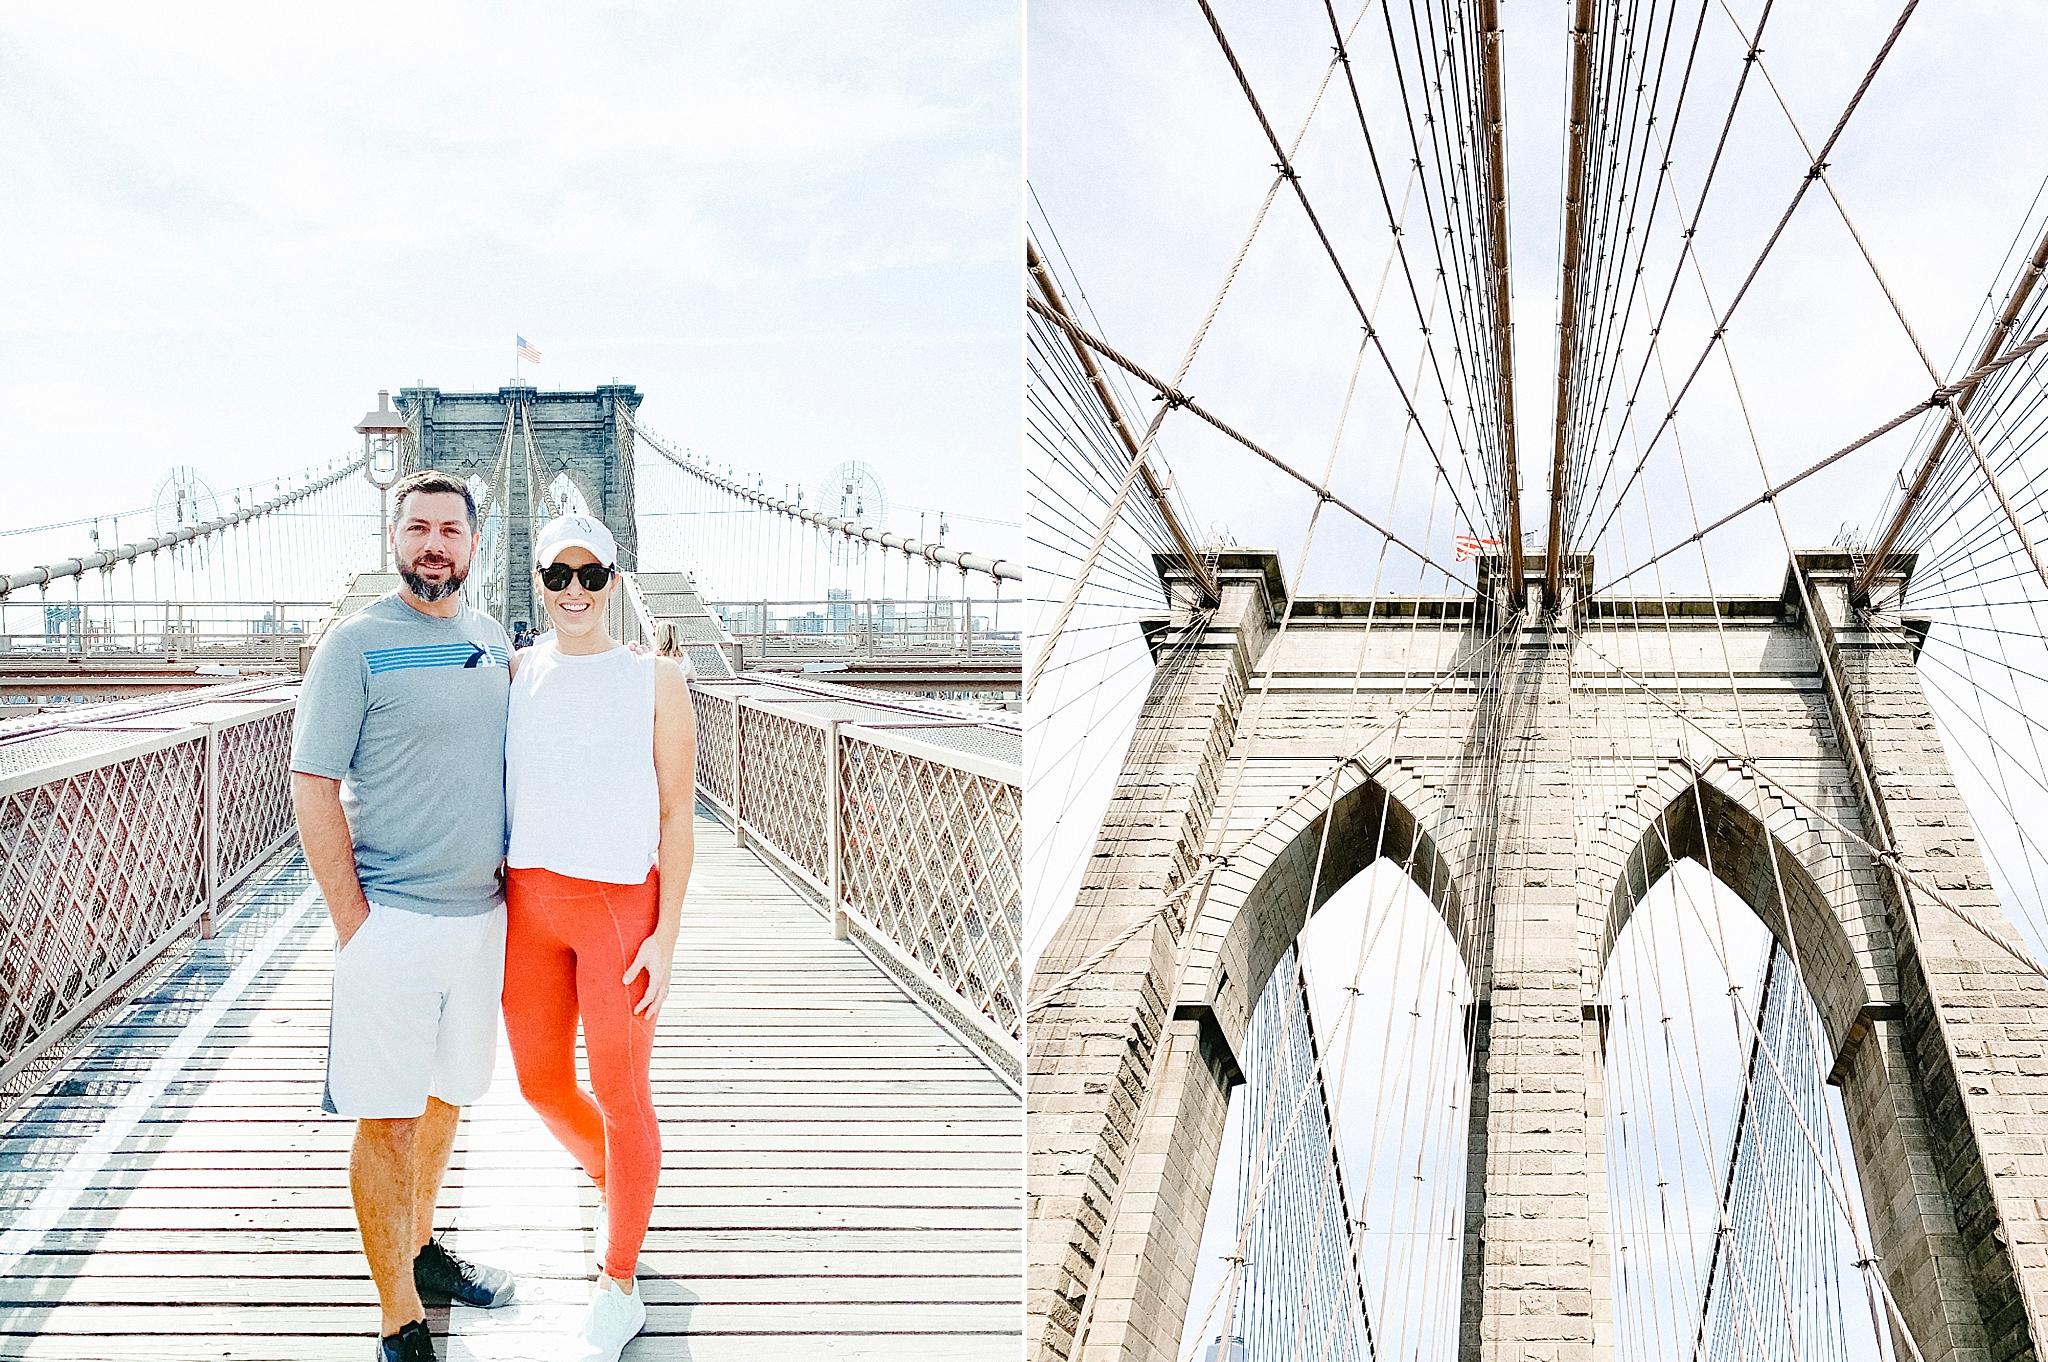 36 Hours in NYC_Cathy Durig_0010.jpg